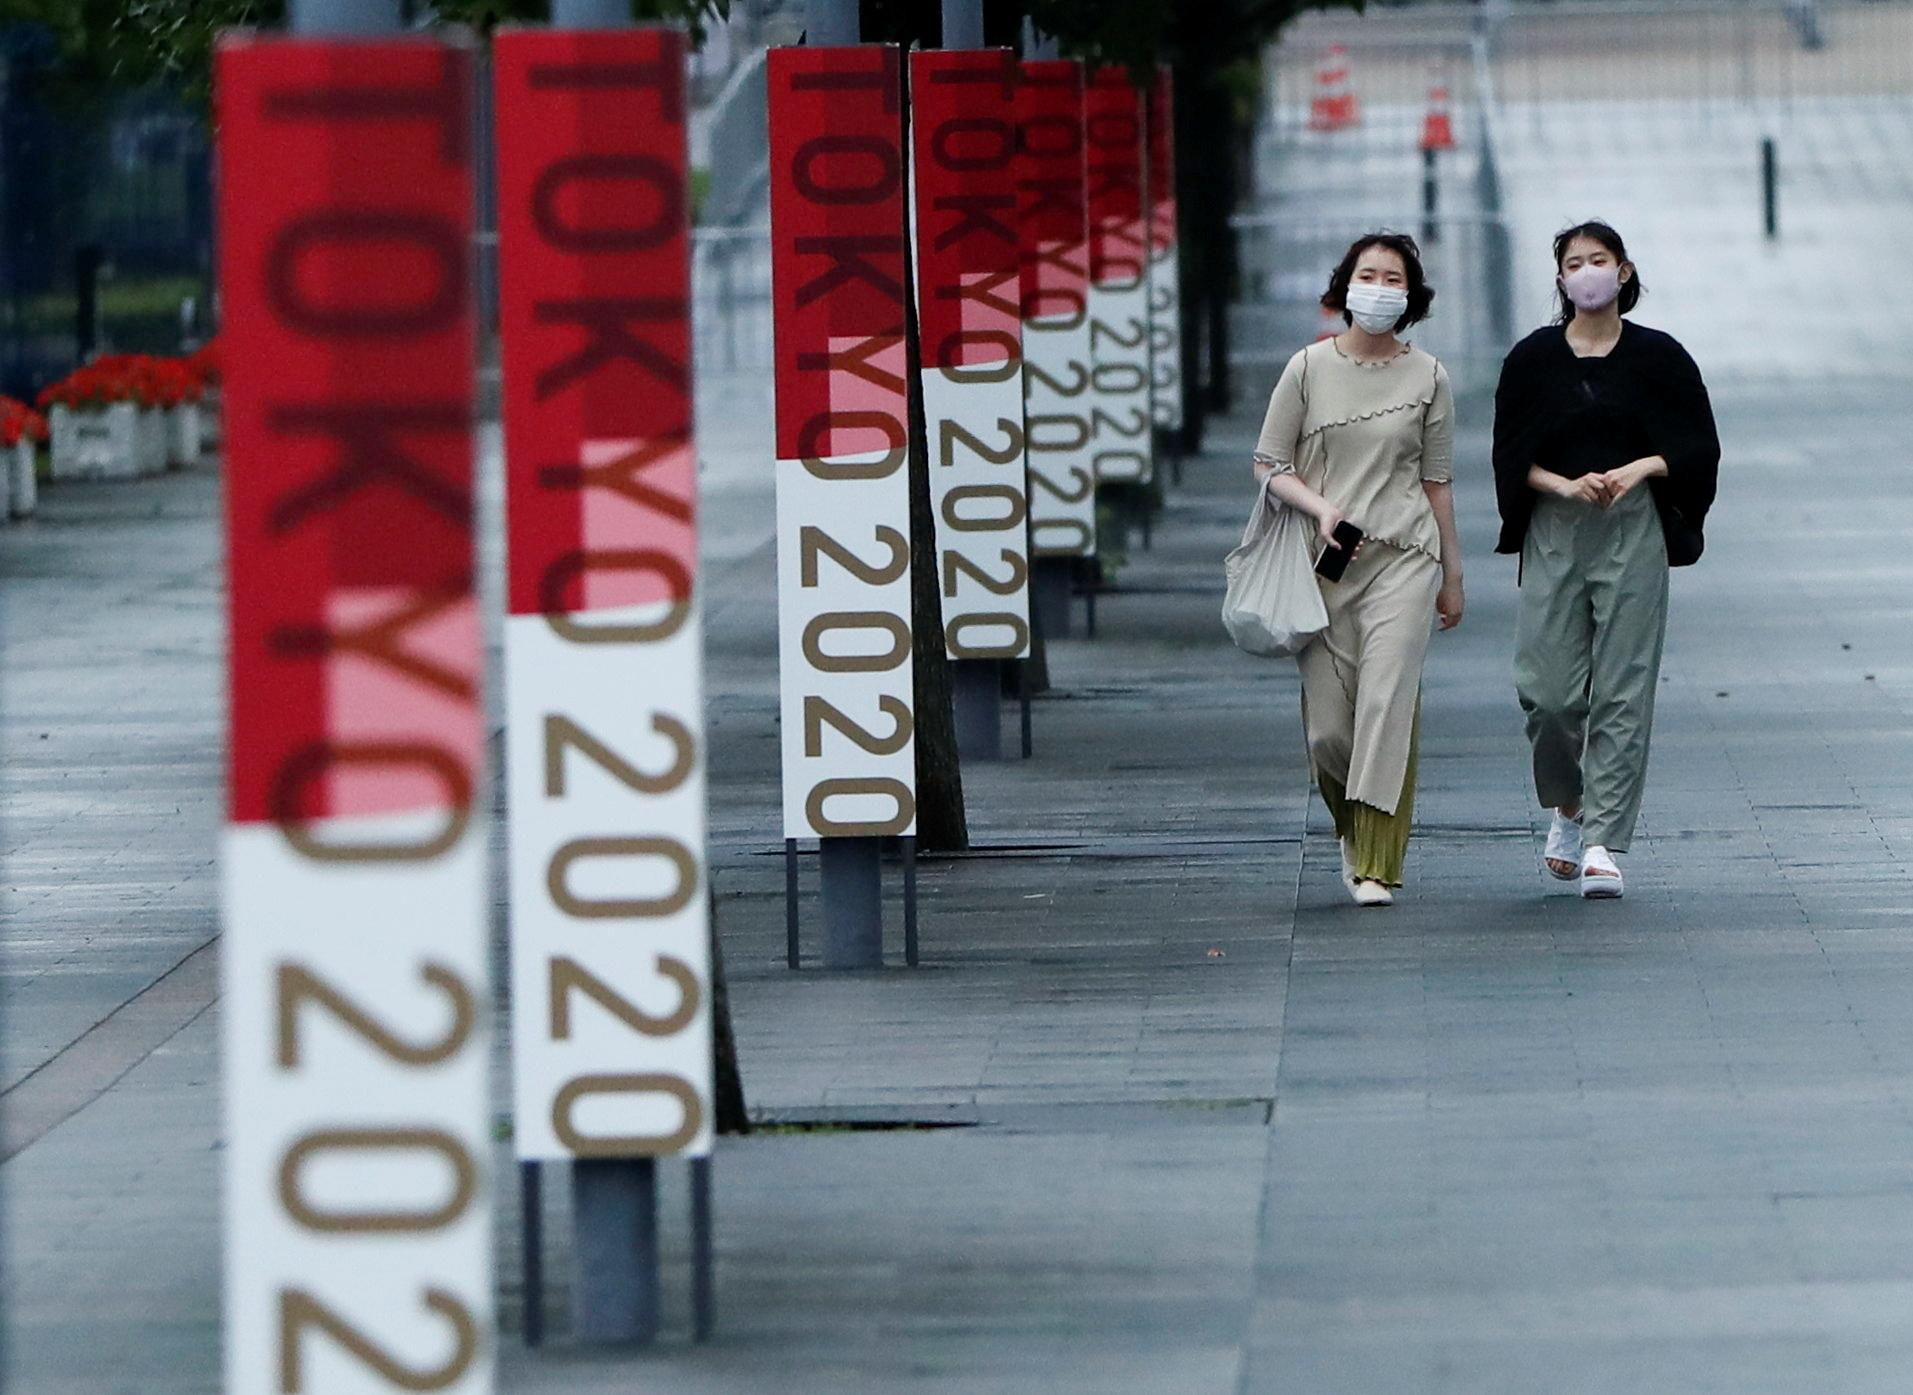 Regrettable': Tokyo Olympics to be held without spectators | Olympics News | Al Jazeera